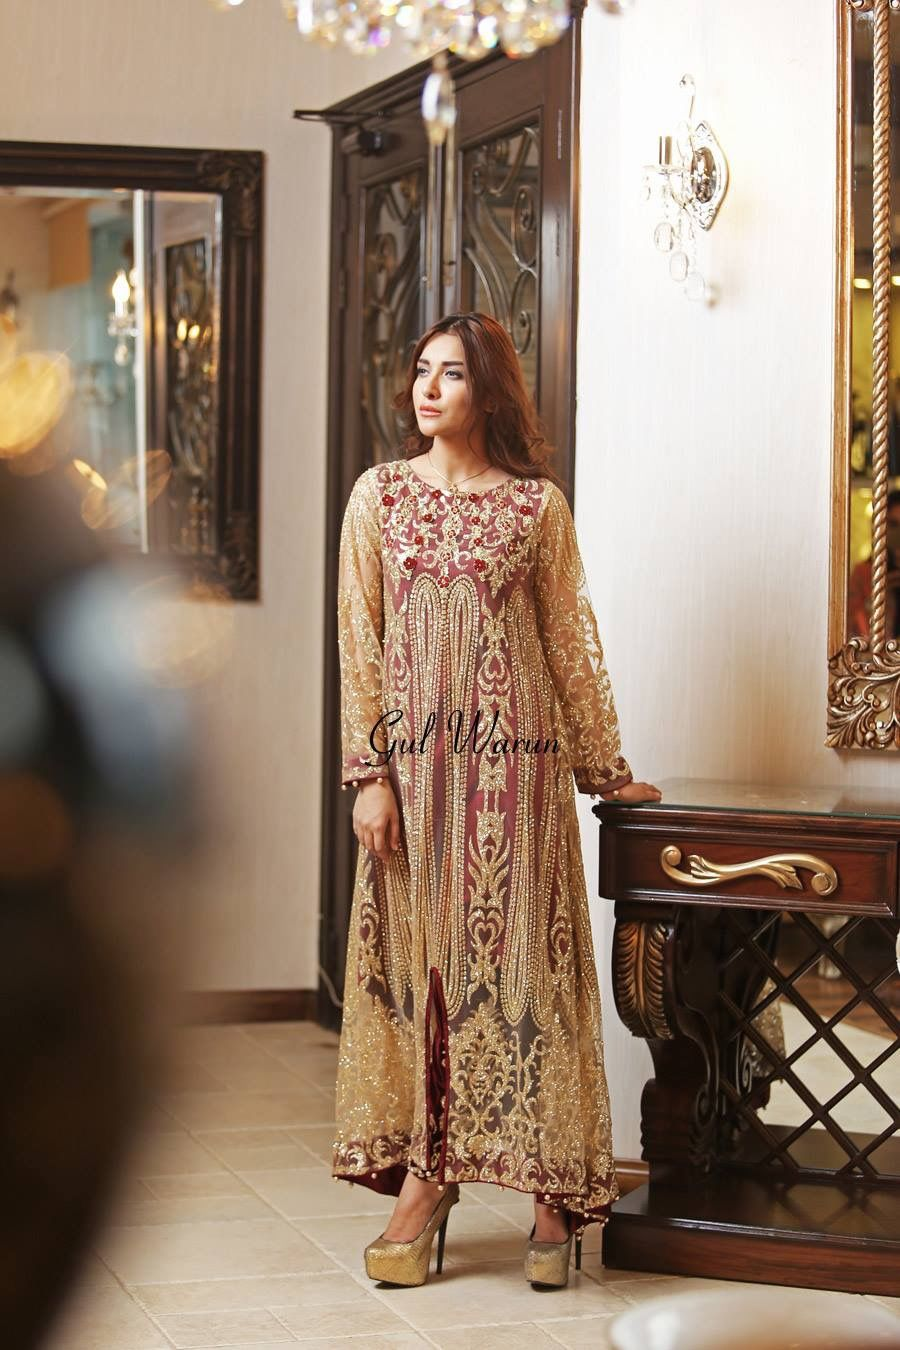 Pin von Tammy Maria Settles auf ~Fashion~Pakistan~ | Pinterest